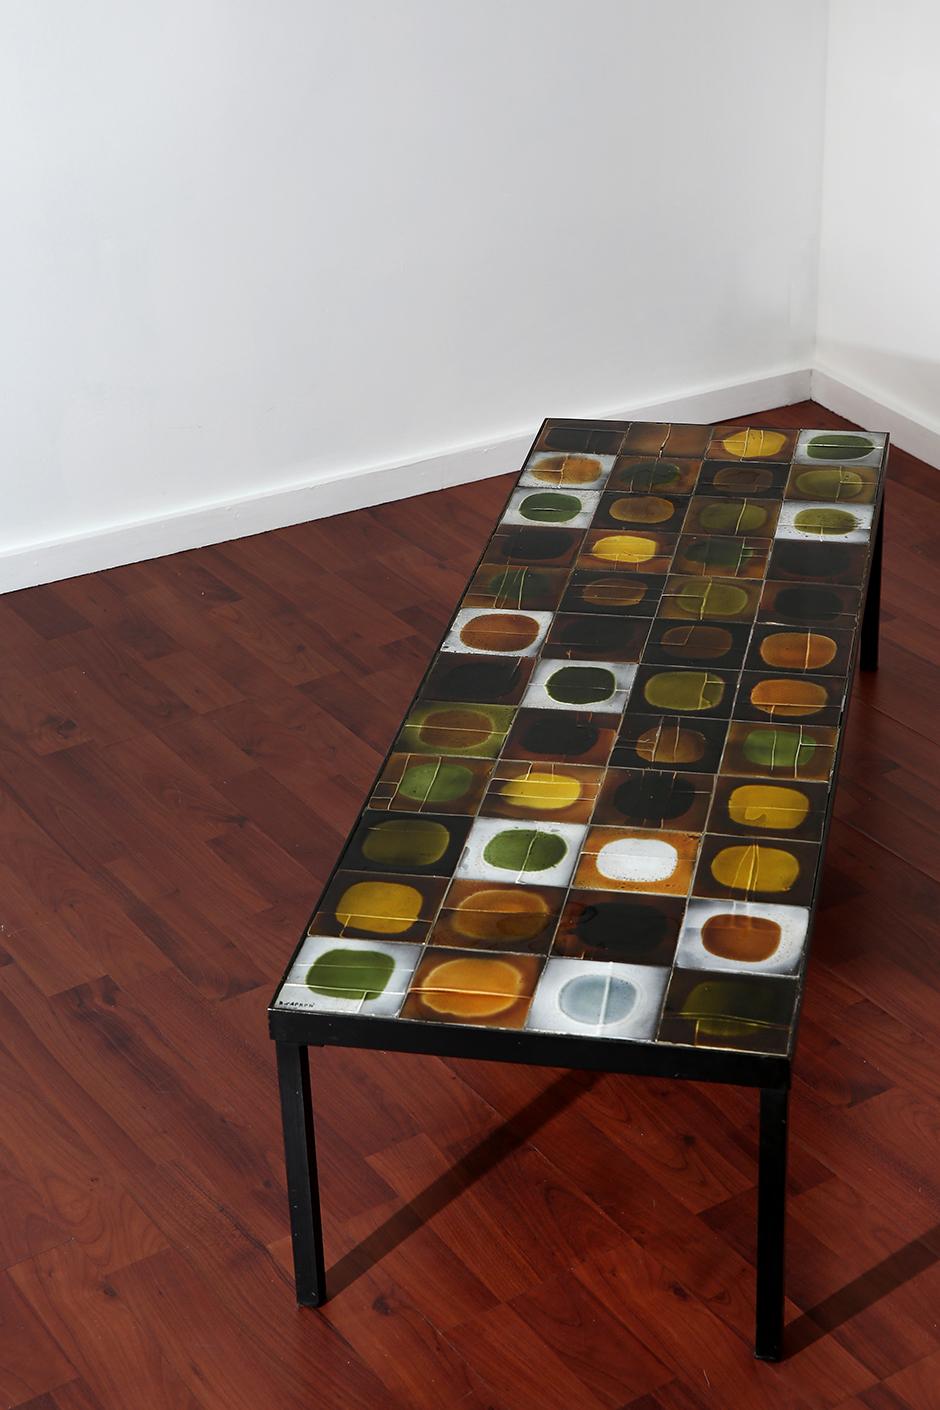 Roger capron mg galerie for Table en ceramique rectangulaire